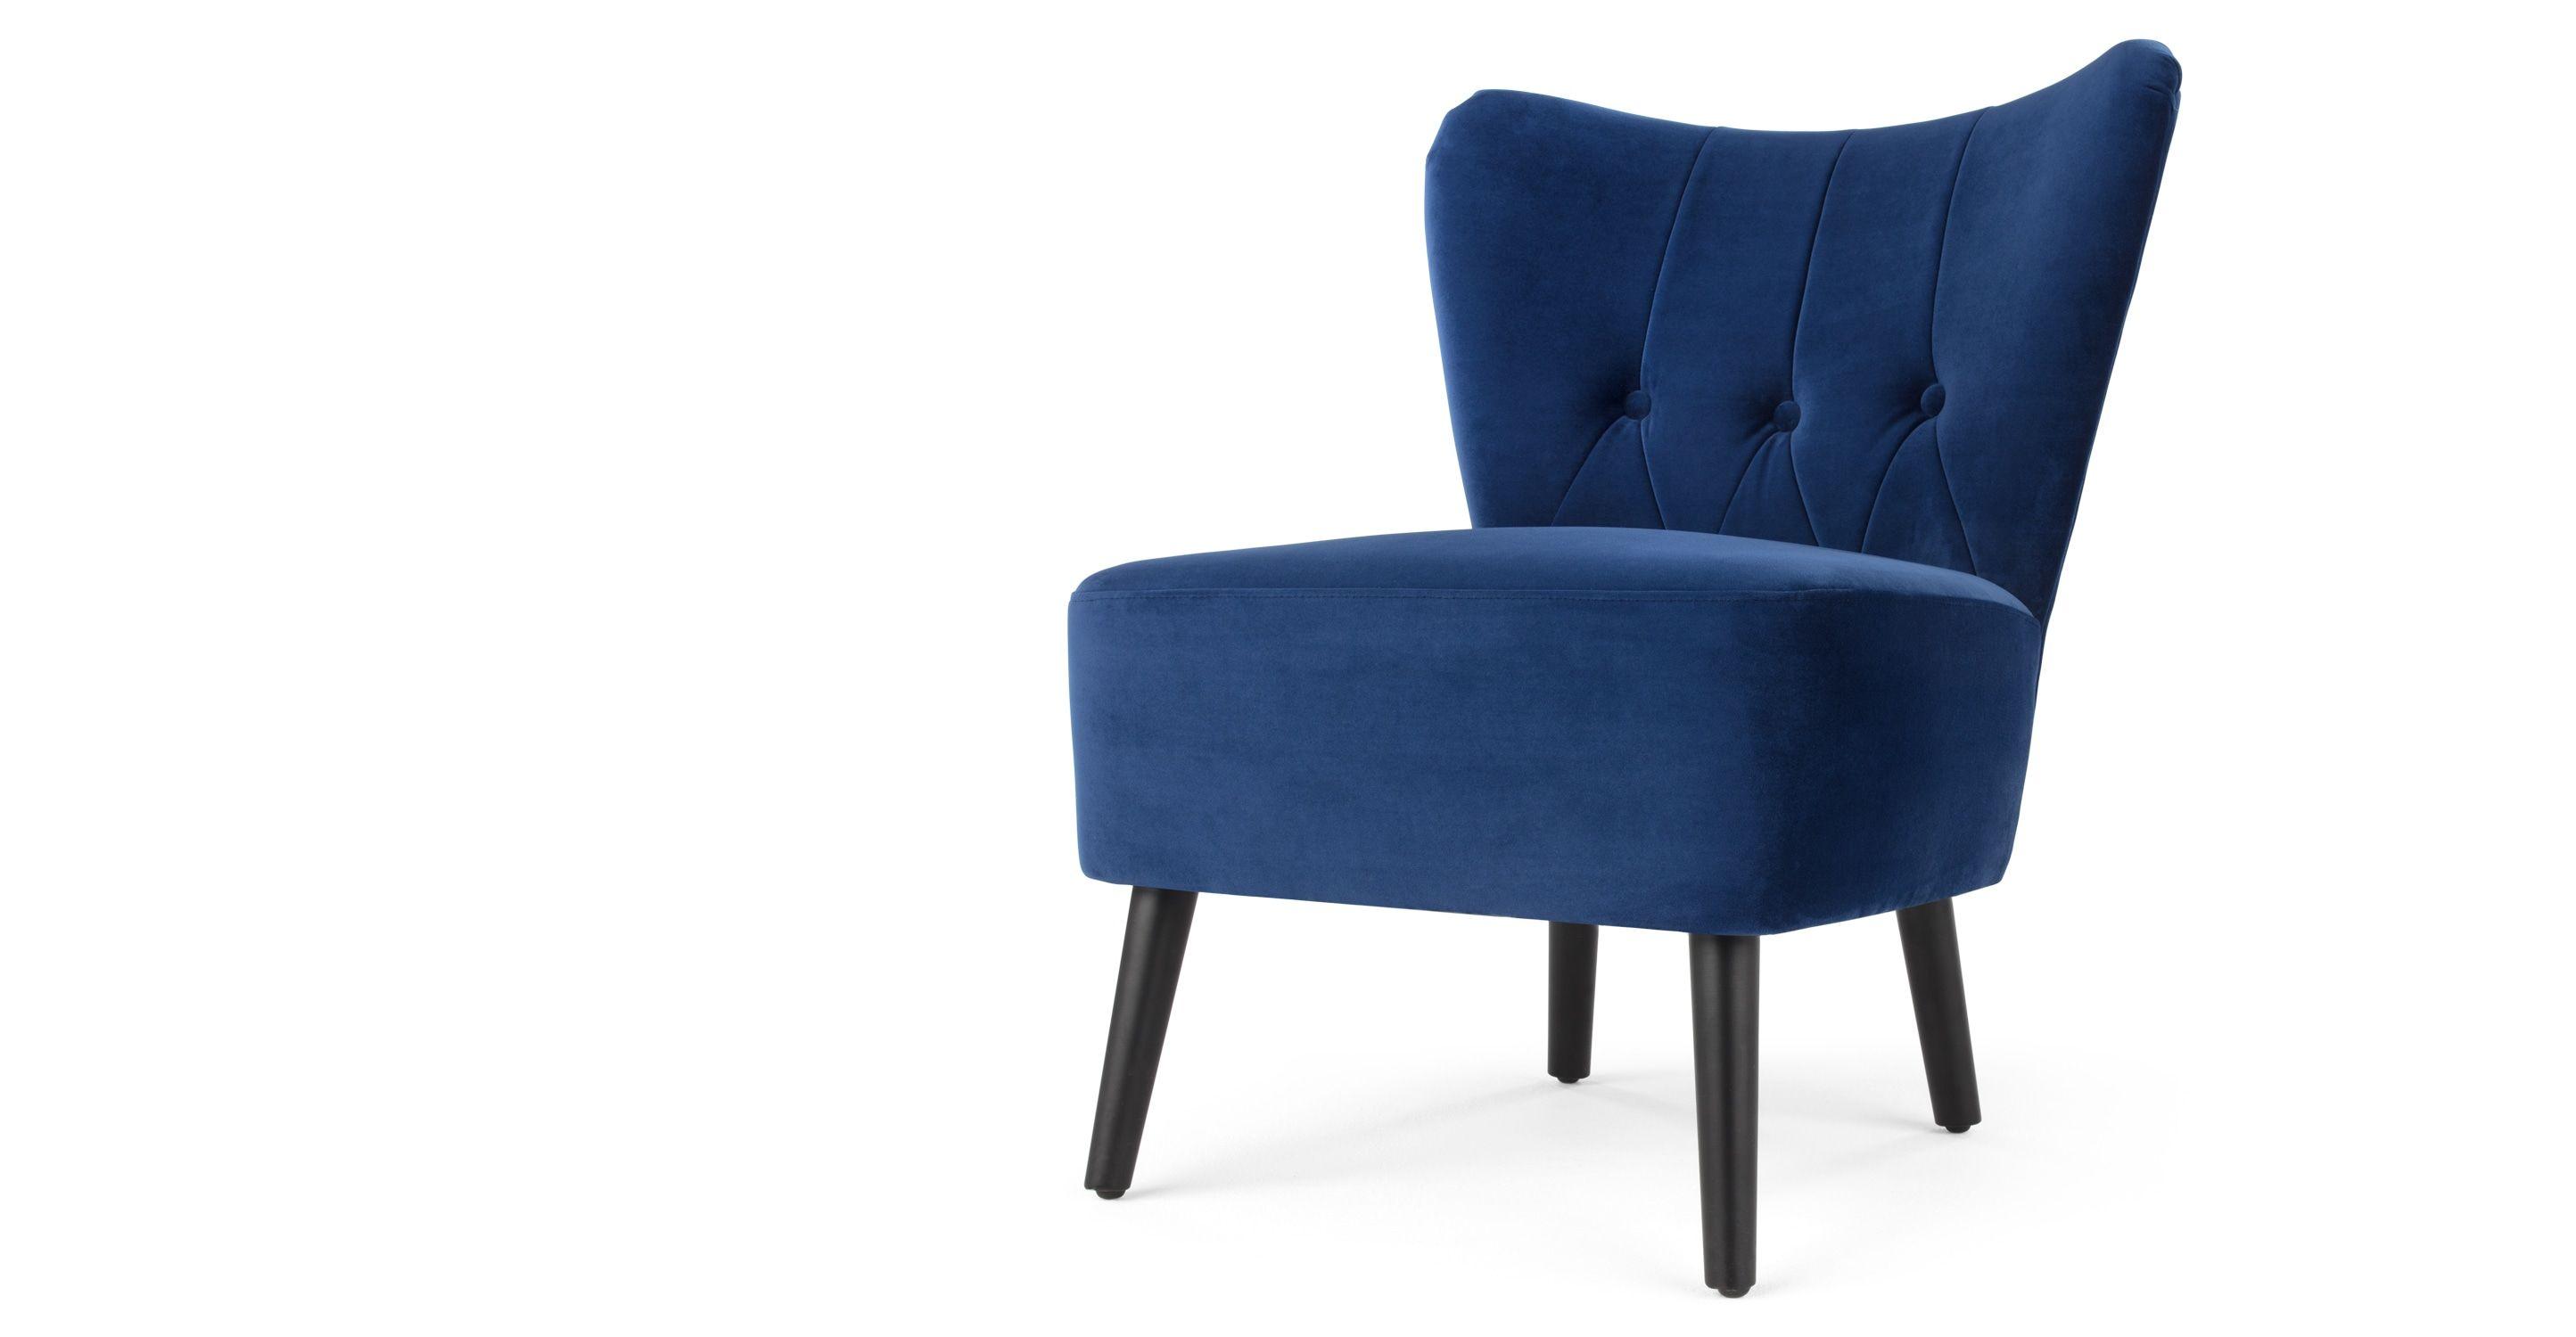 Design Alle Sessel Charley Sessel Samt In Cyanblau Made